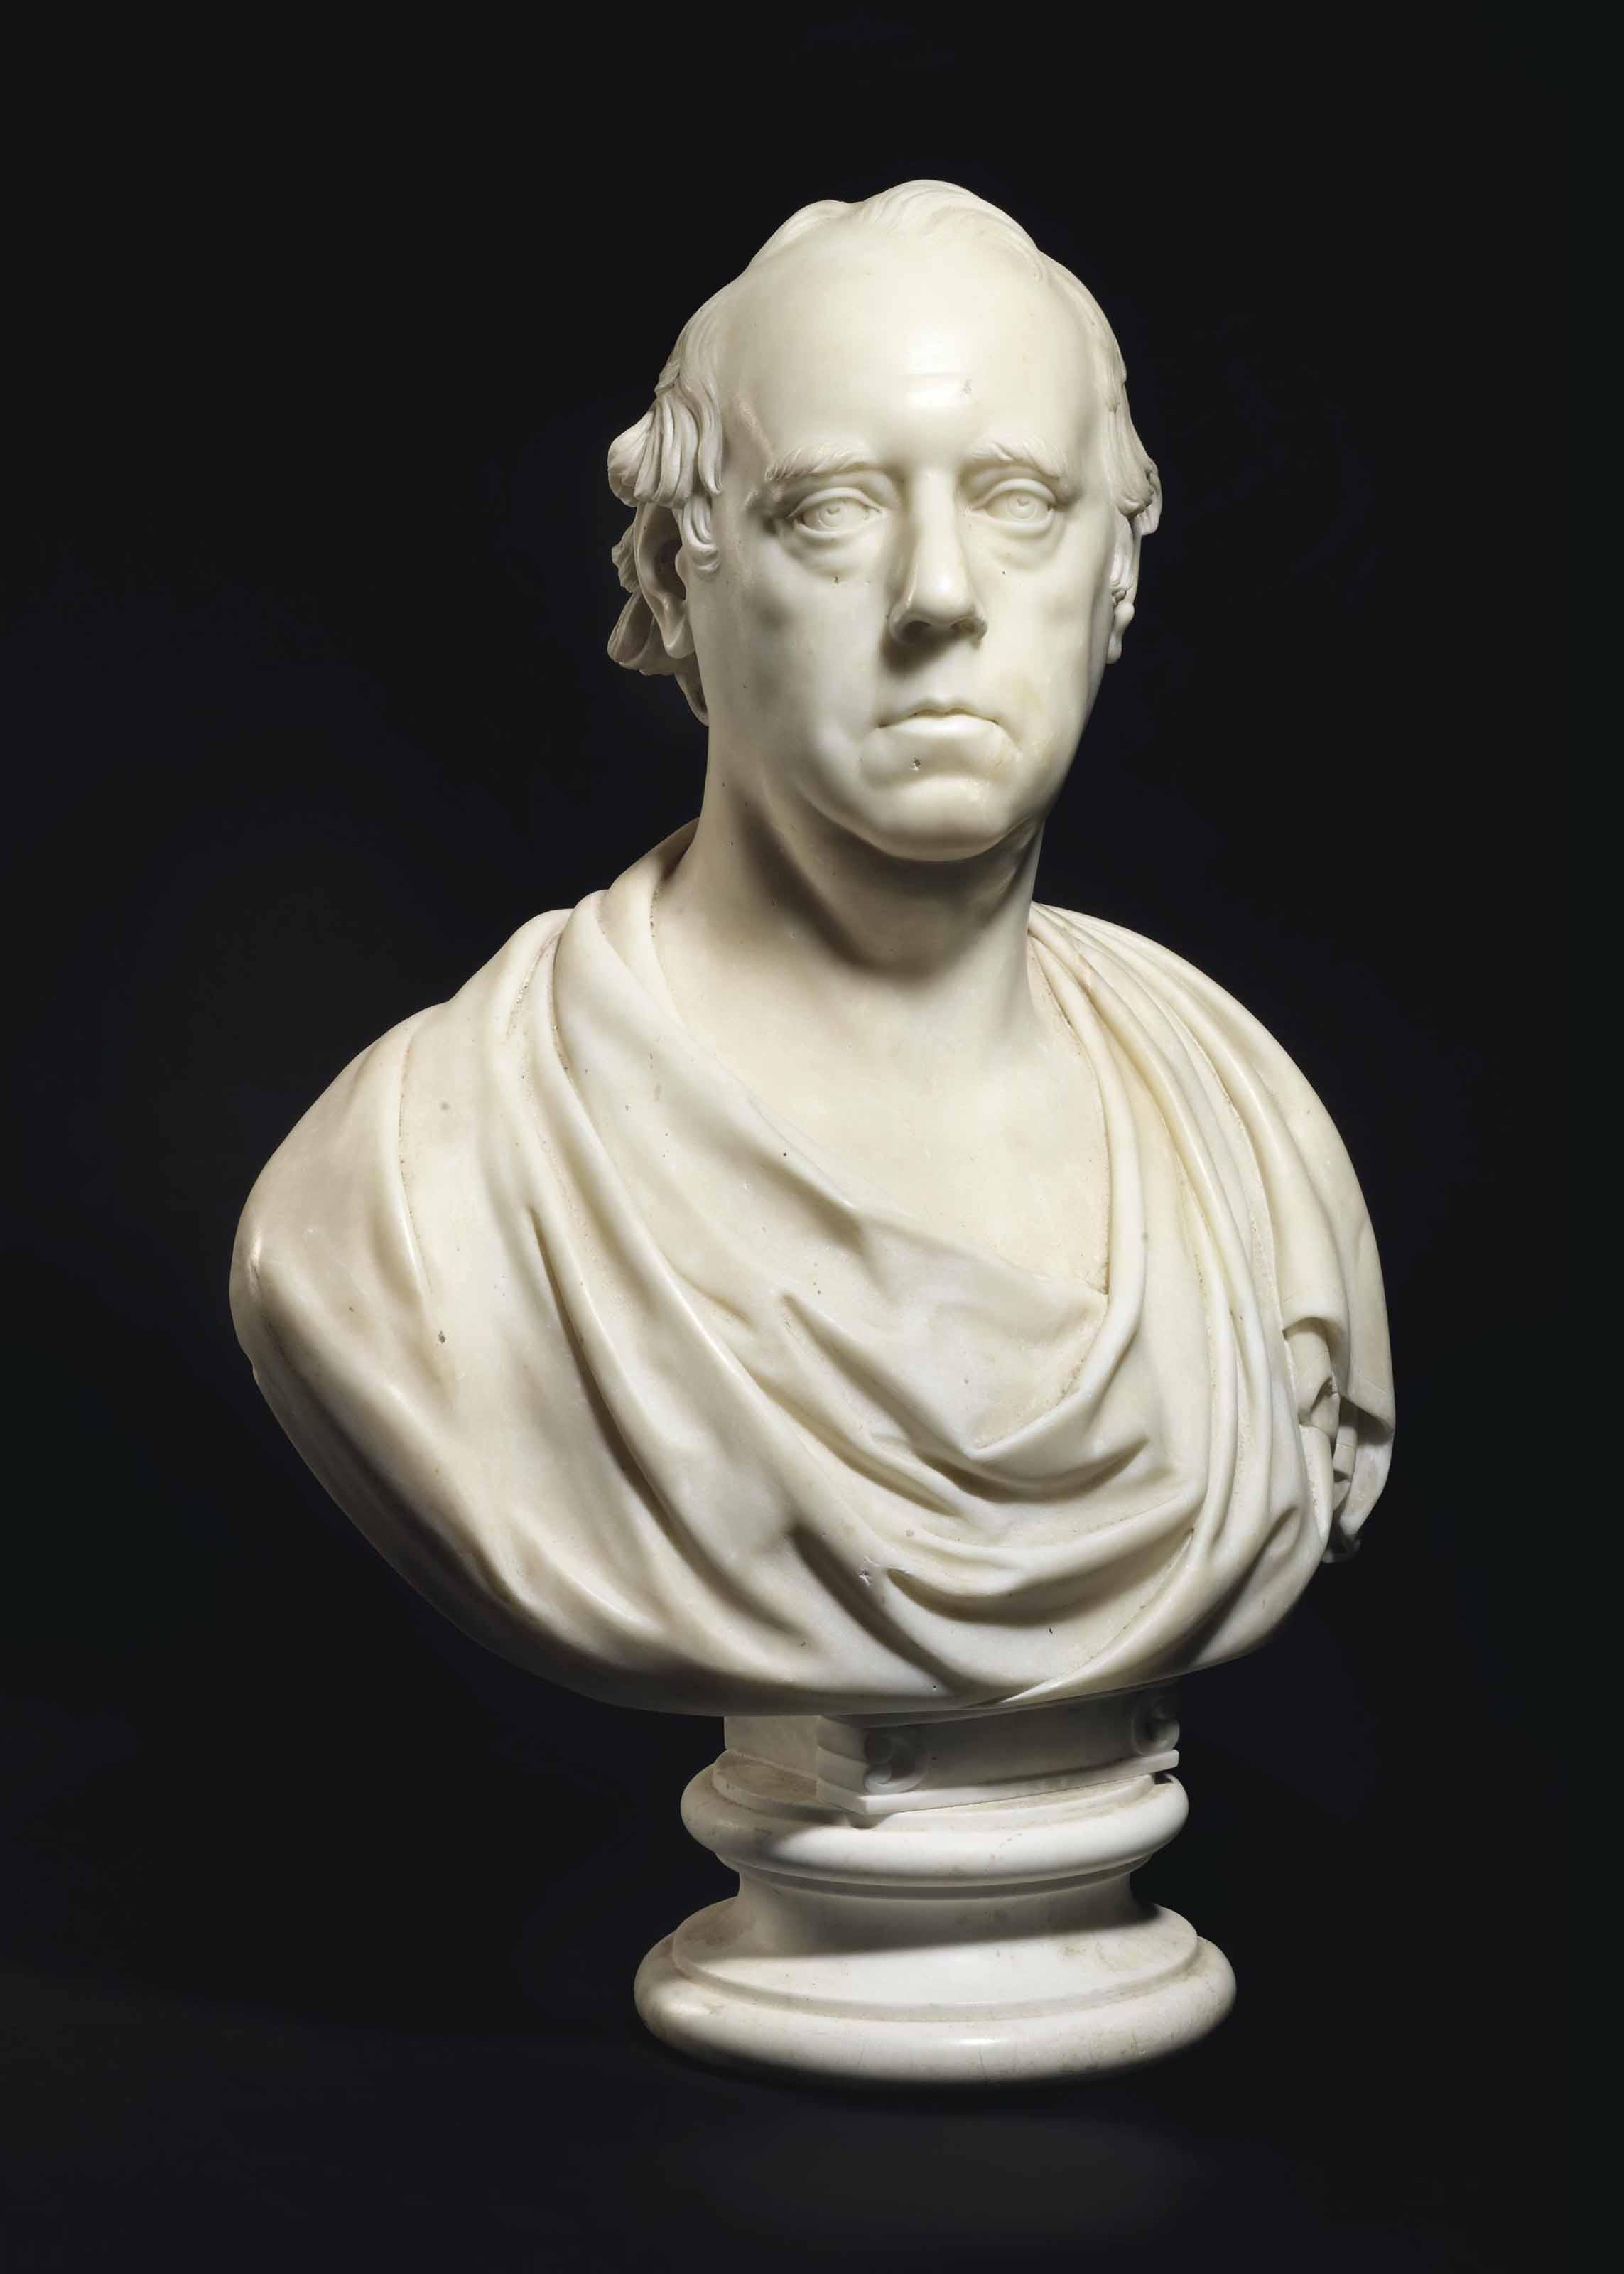 BUSTE EN MARBRE SCULPTE REPRESENTANT CHARLES KENDAL BUSHE (1767-1843), LORD JUGE EN CHEF D'IRLANDE